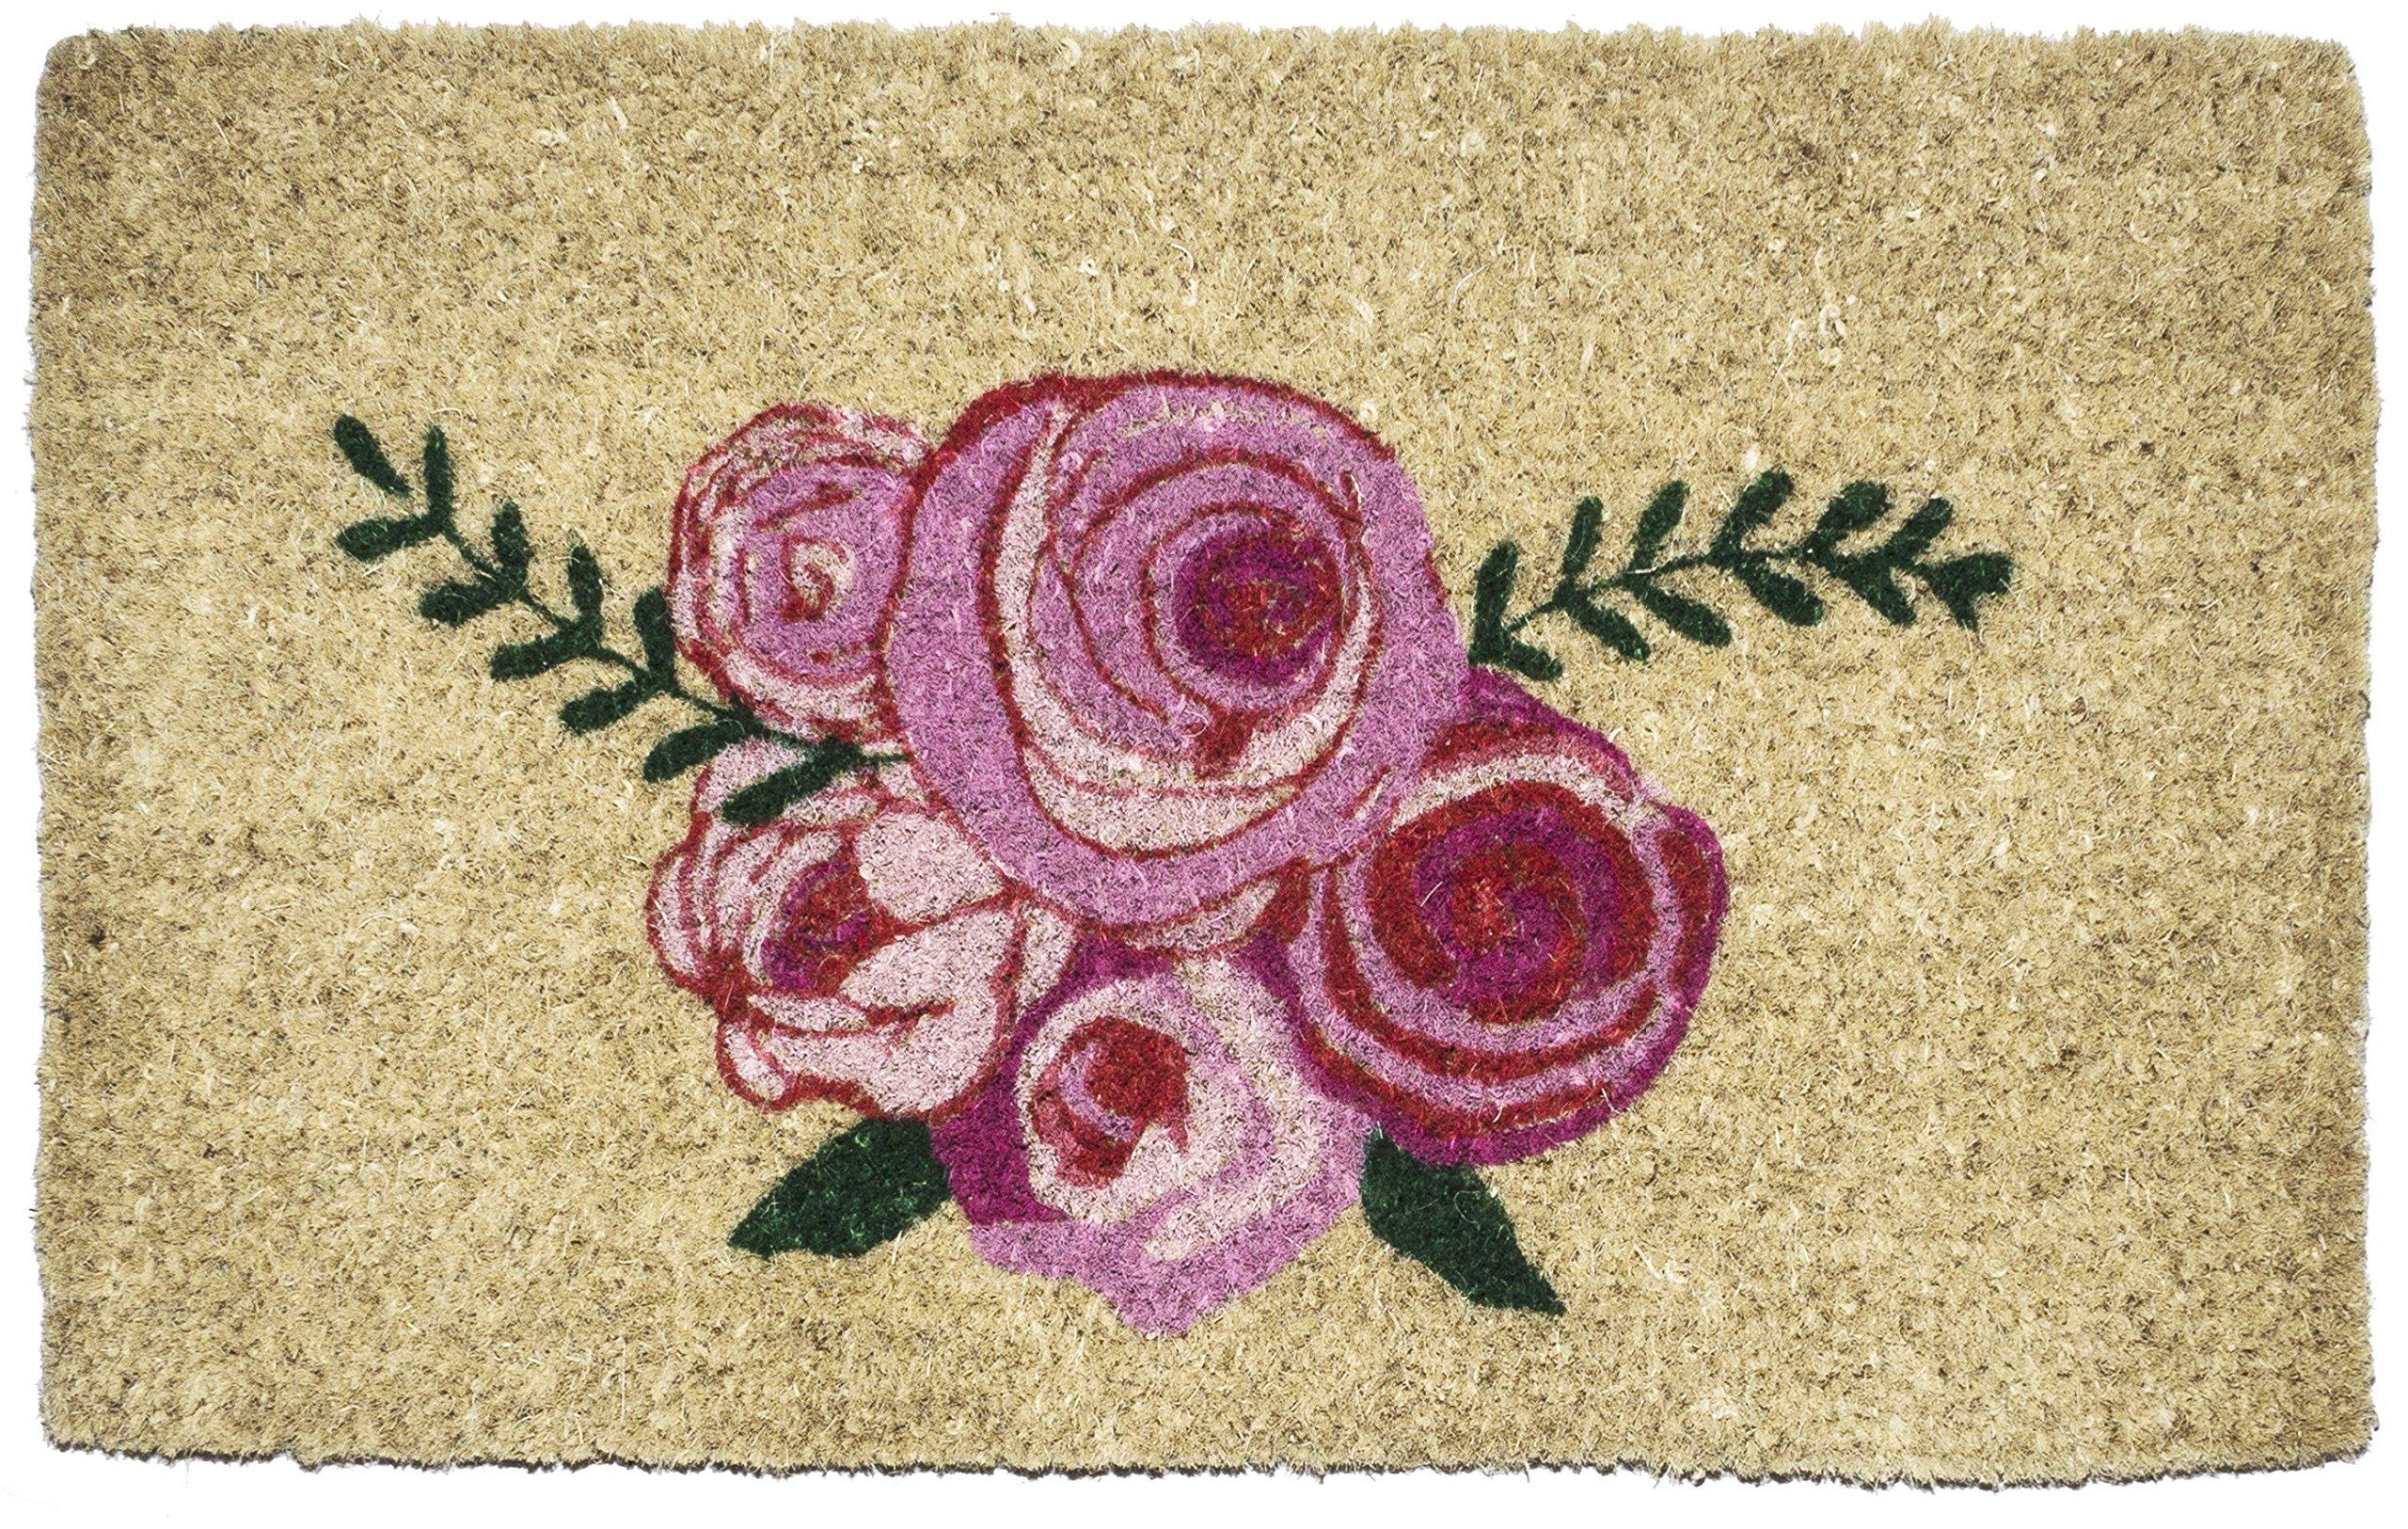 Entryways Roses, Hand-Stenciled, All-Natural Coconut Fiber Coir Doormat 18'' X 30'' x .75''